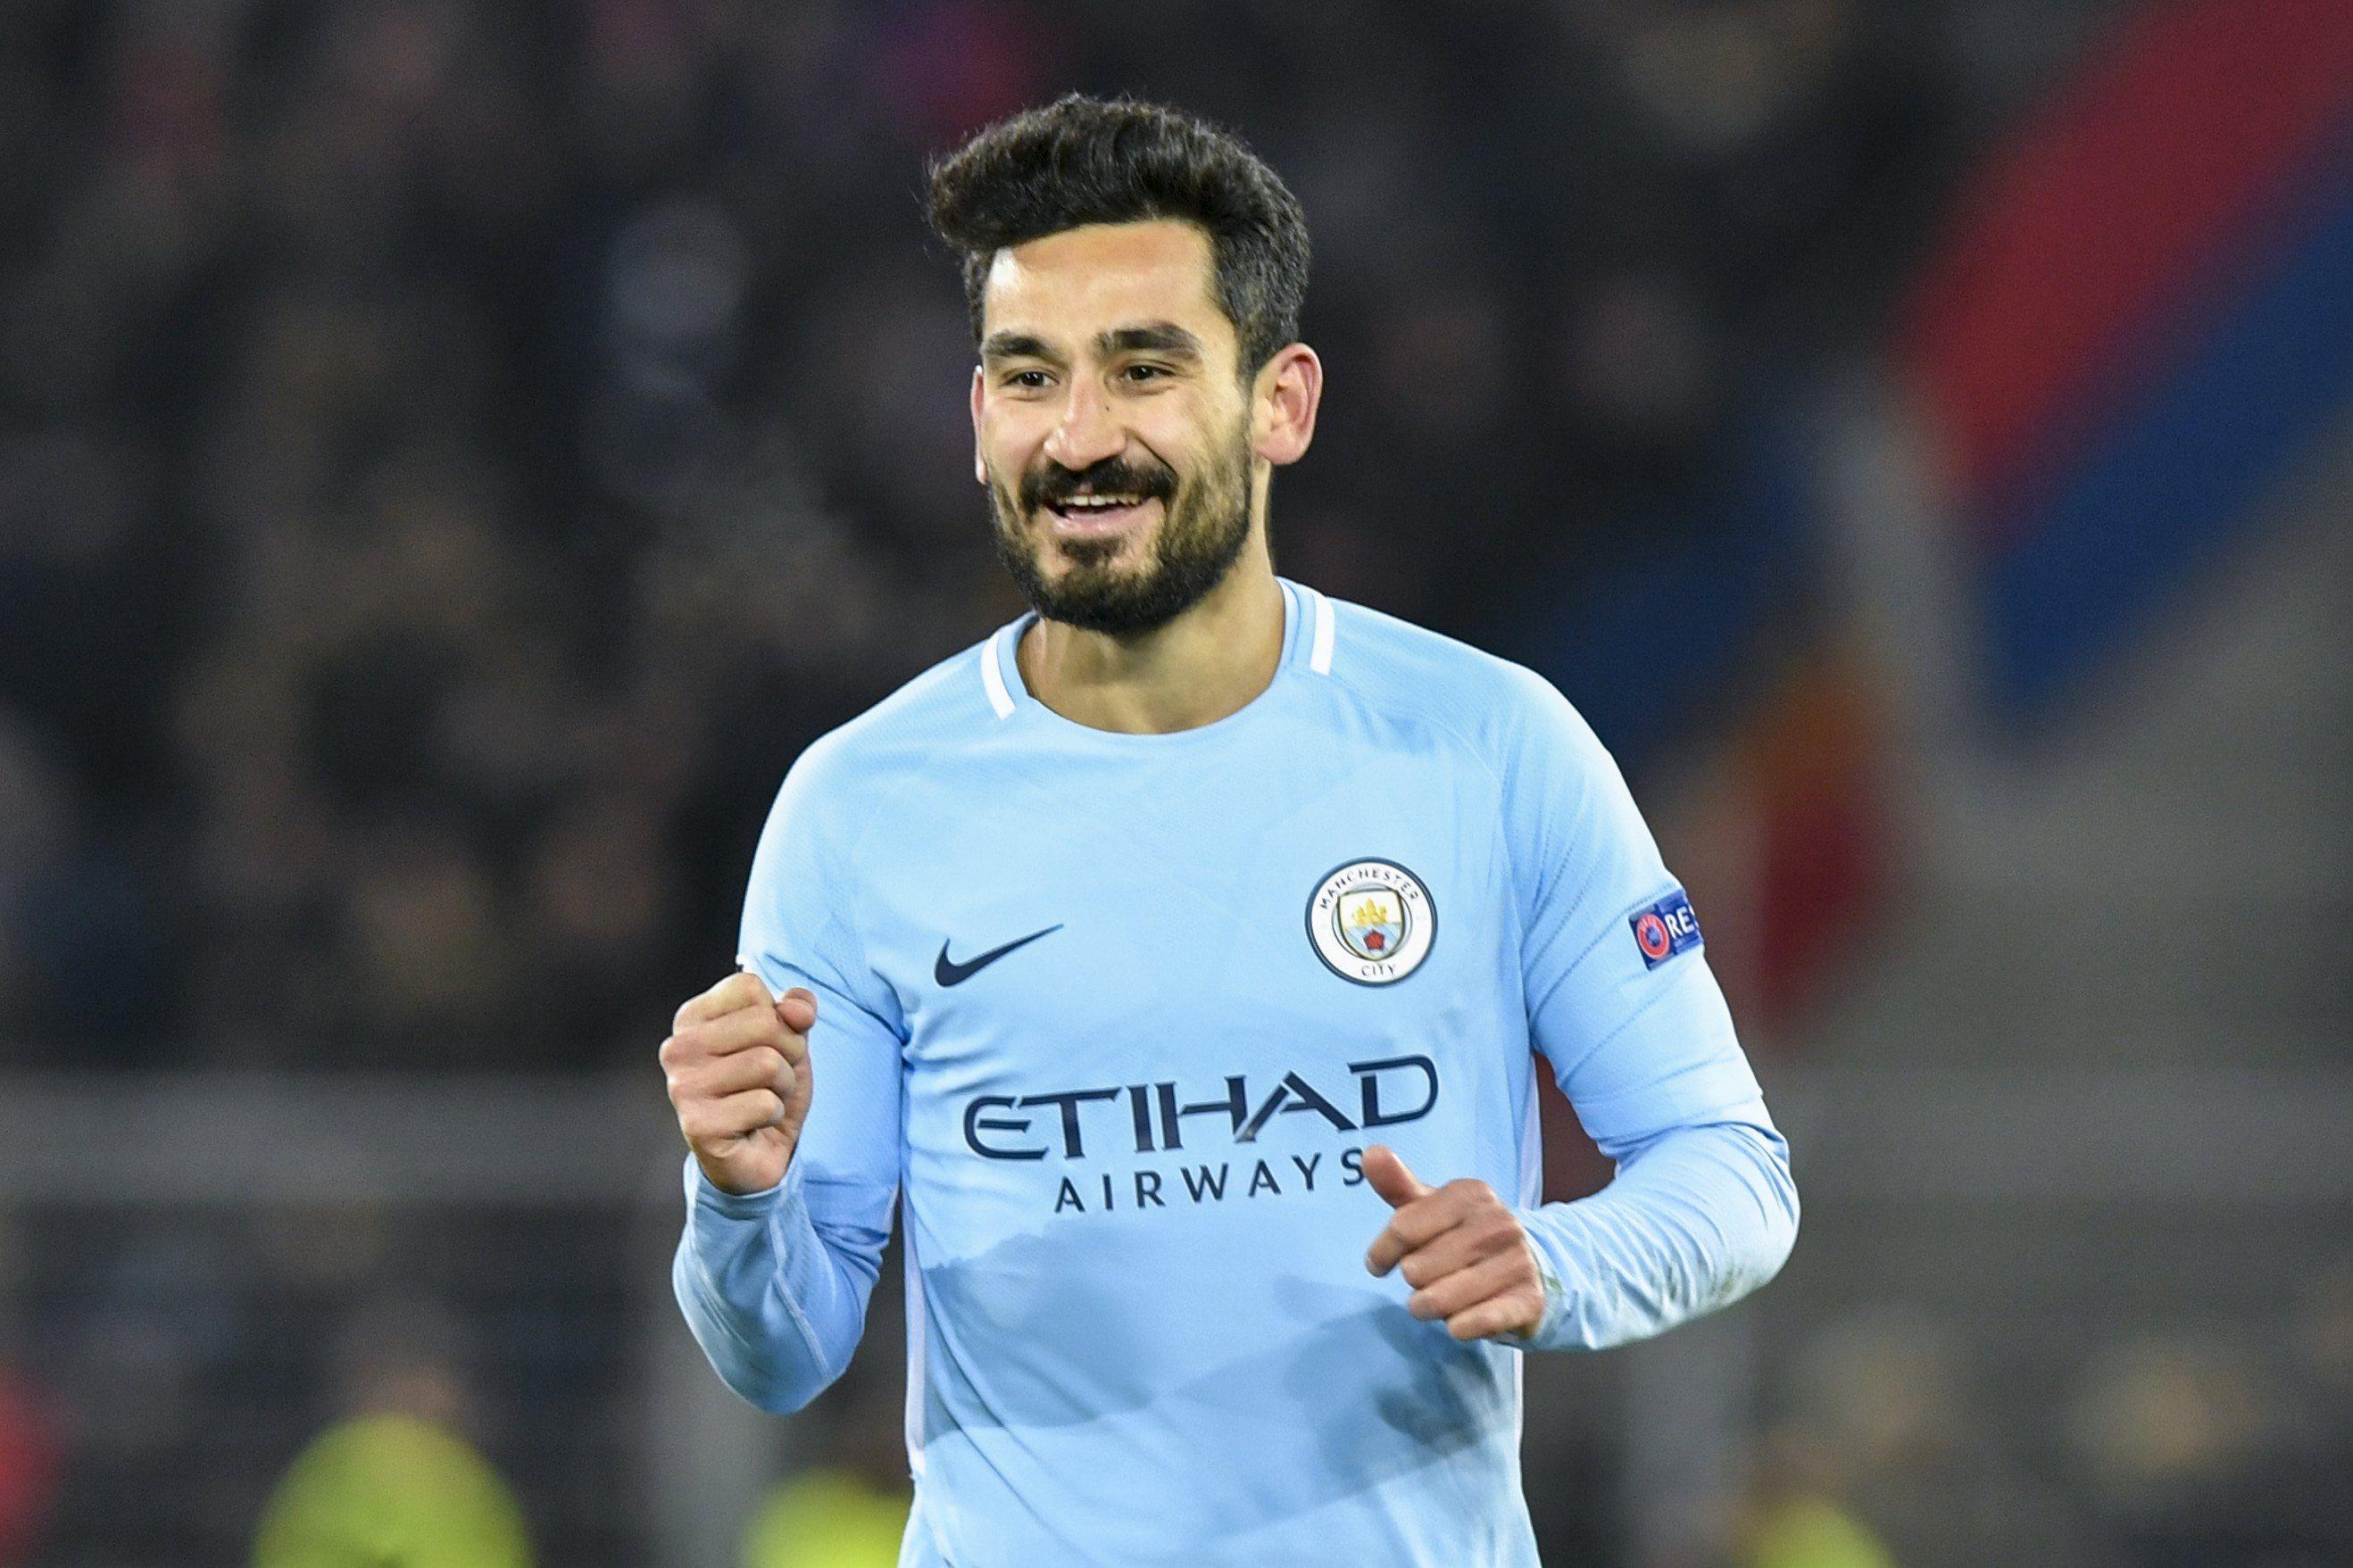 Gündogan convirtió dos goles en la victoria del Manchester City. Foto: EFE